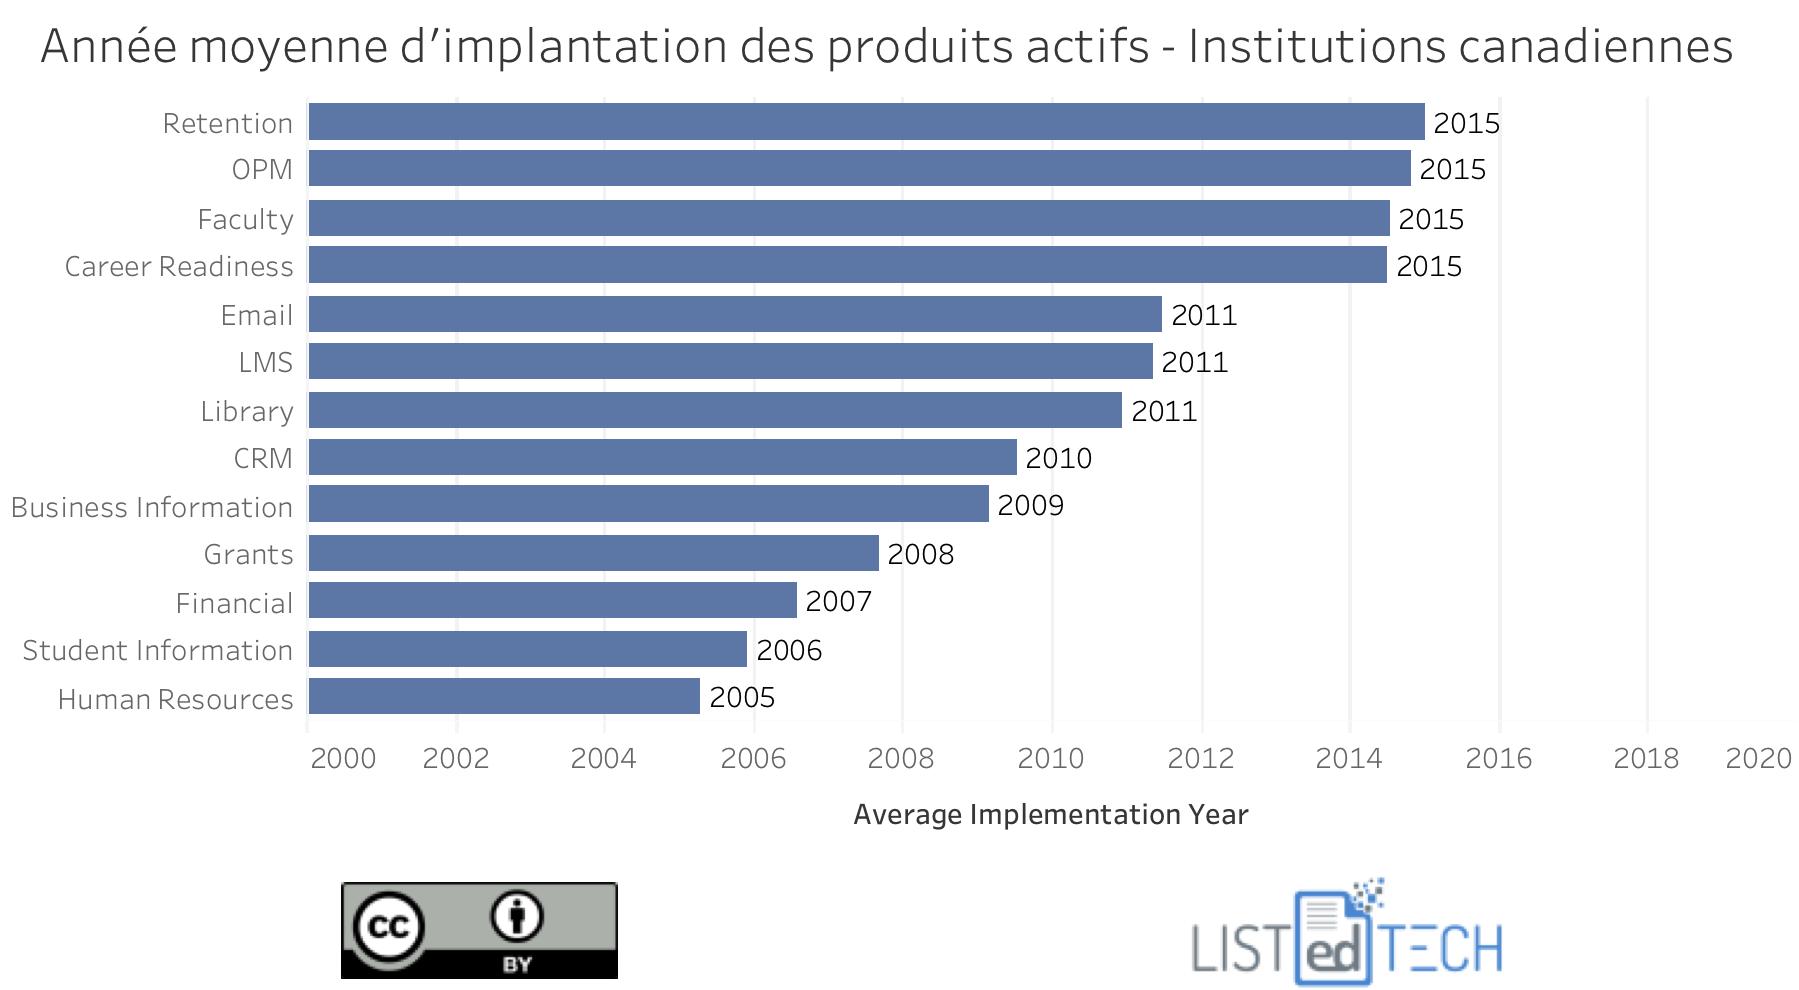 Année moyenne d'implantation - can.png